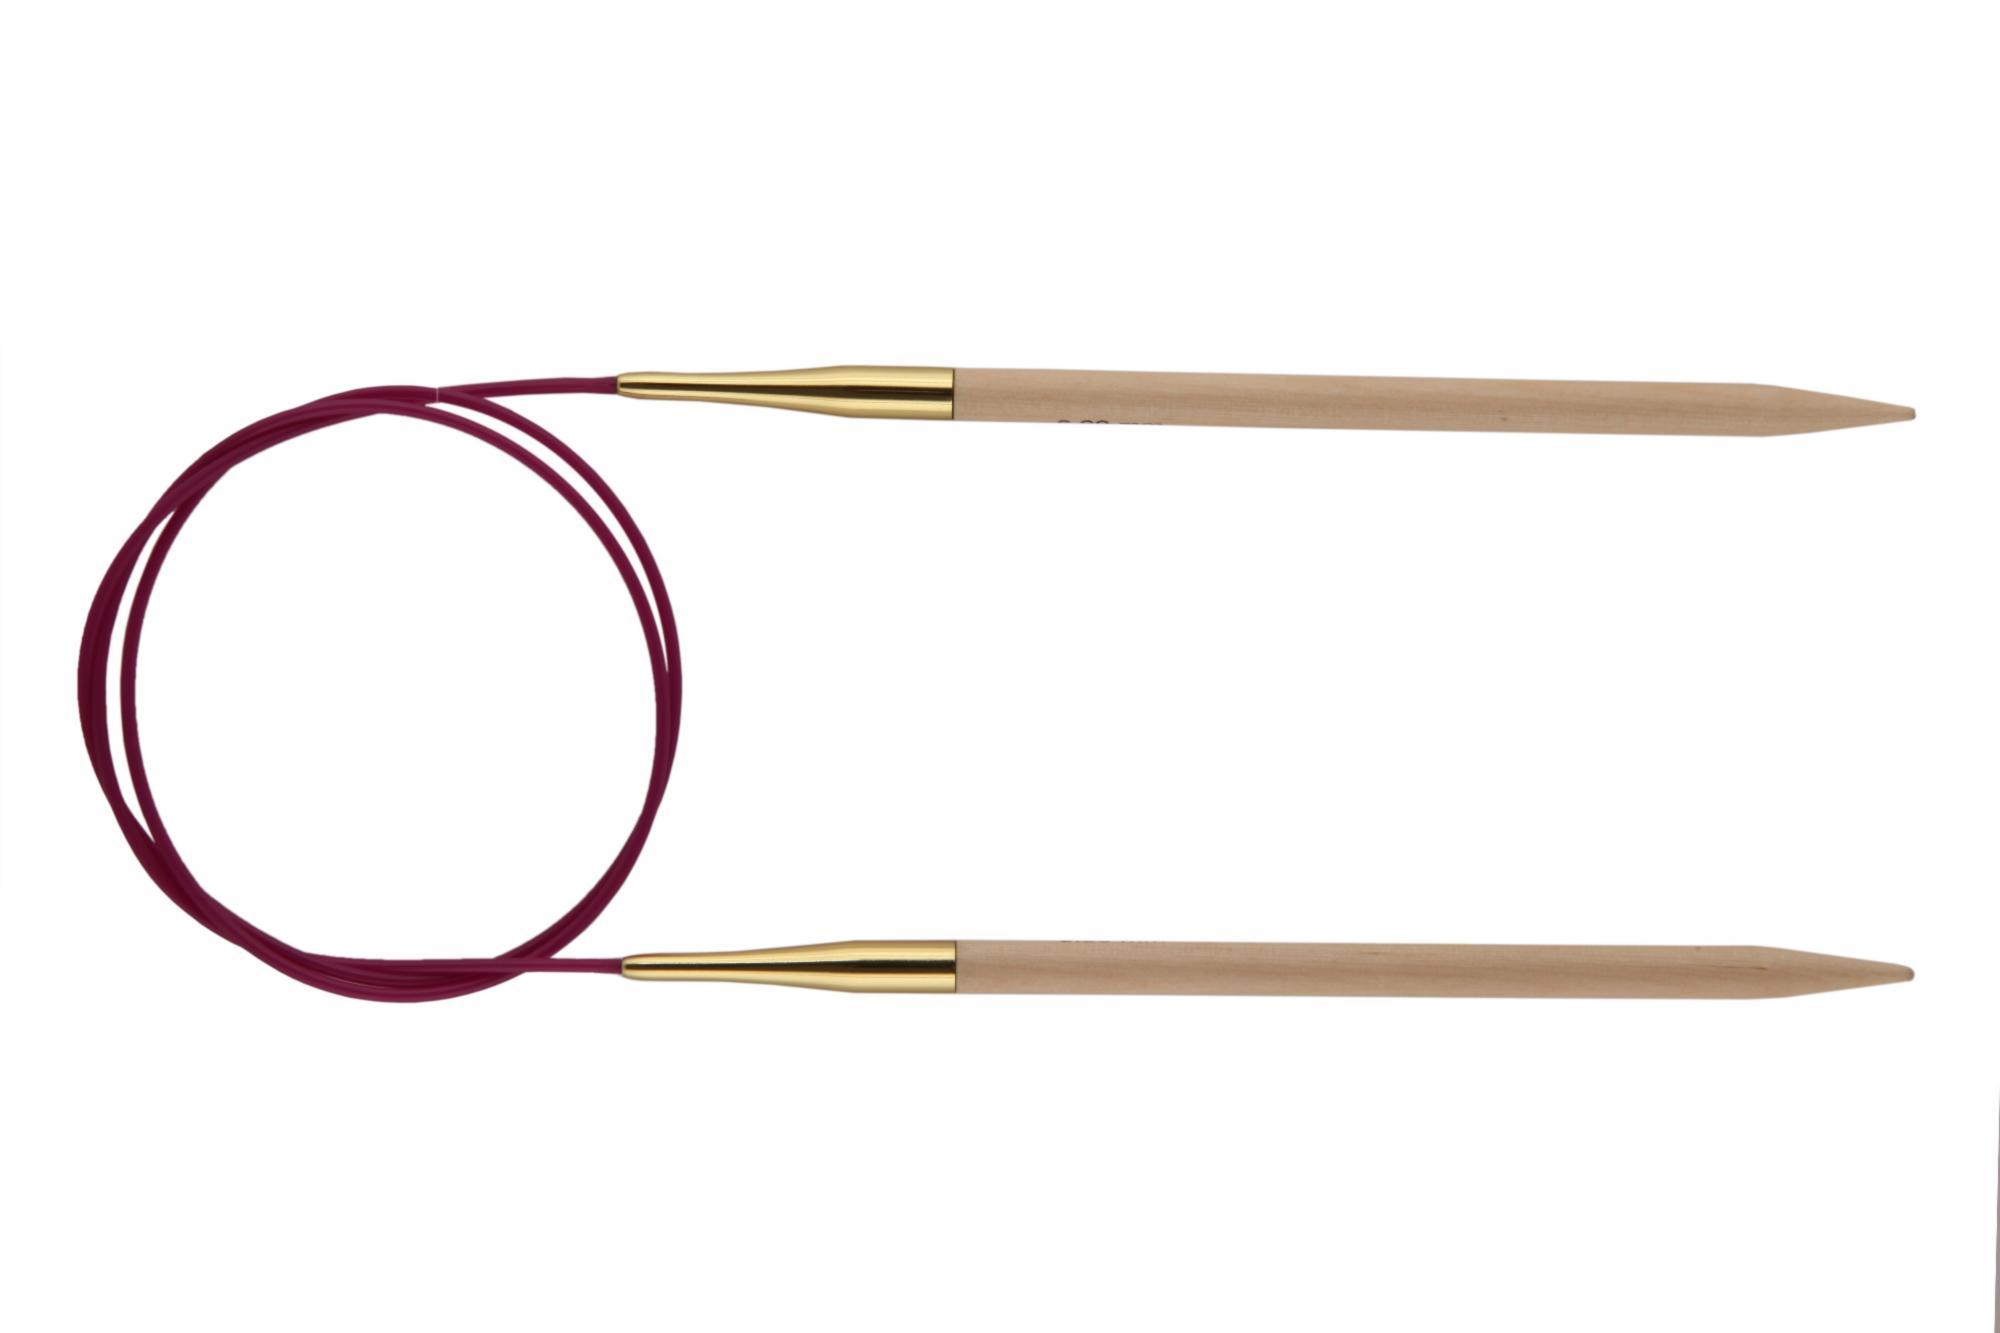 Спицы круговые 100 см Basix Birch Wood KnitPro, 35394, 4.00 мм